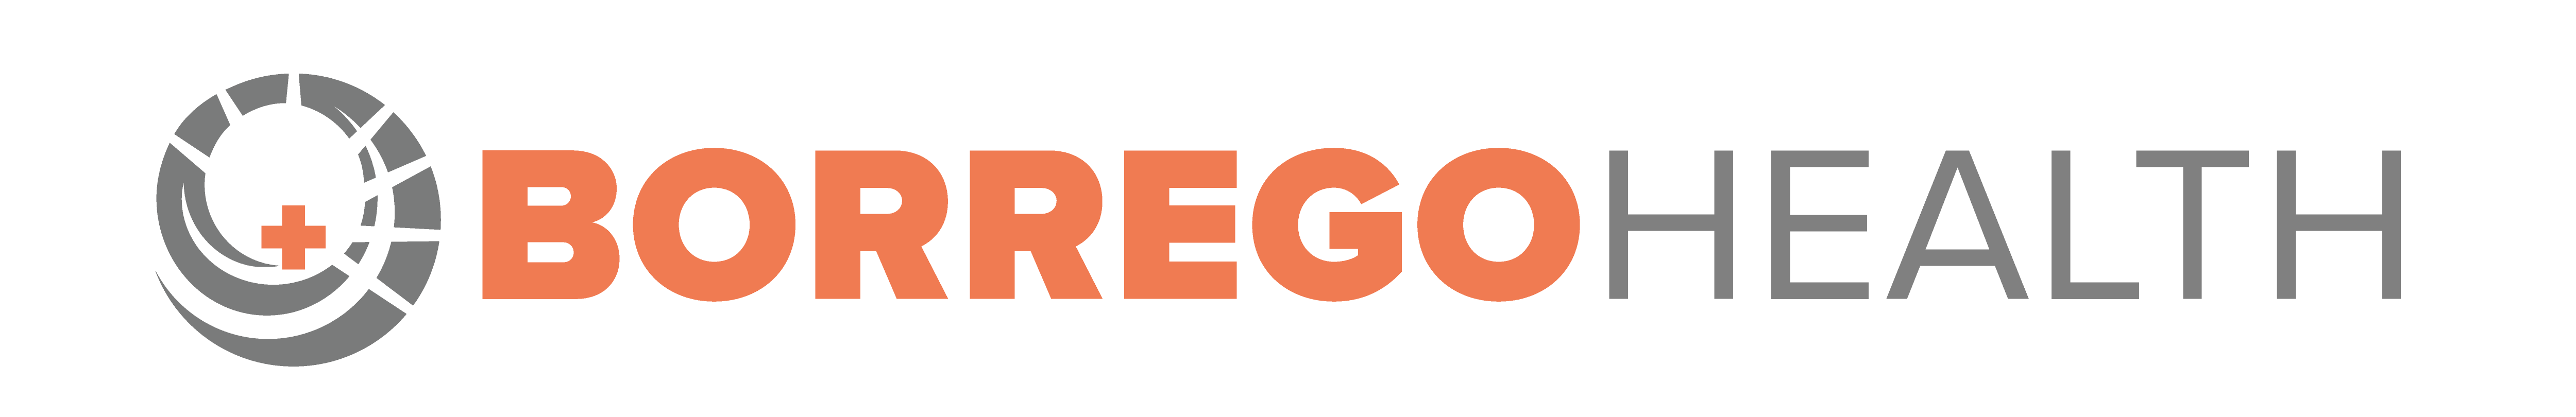 2020 Bh Long Logo